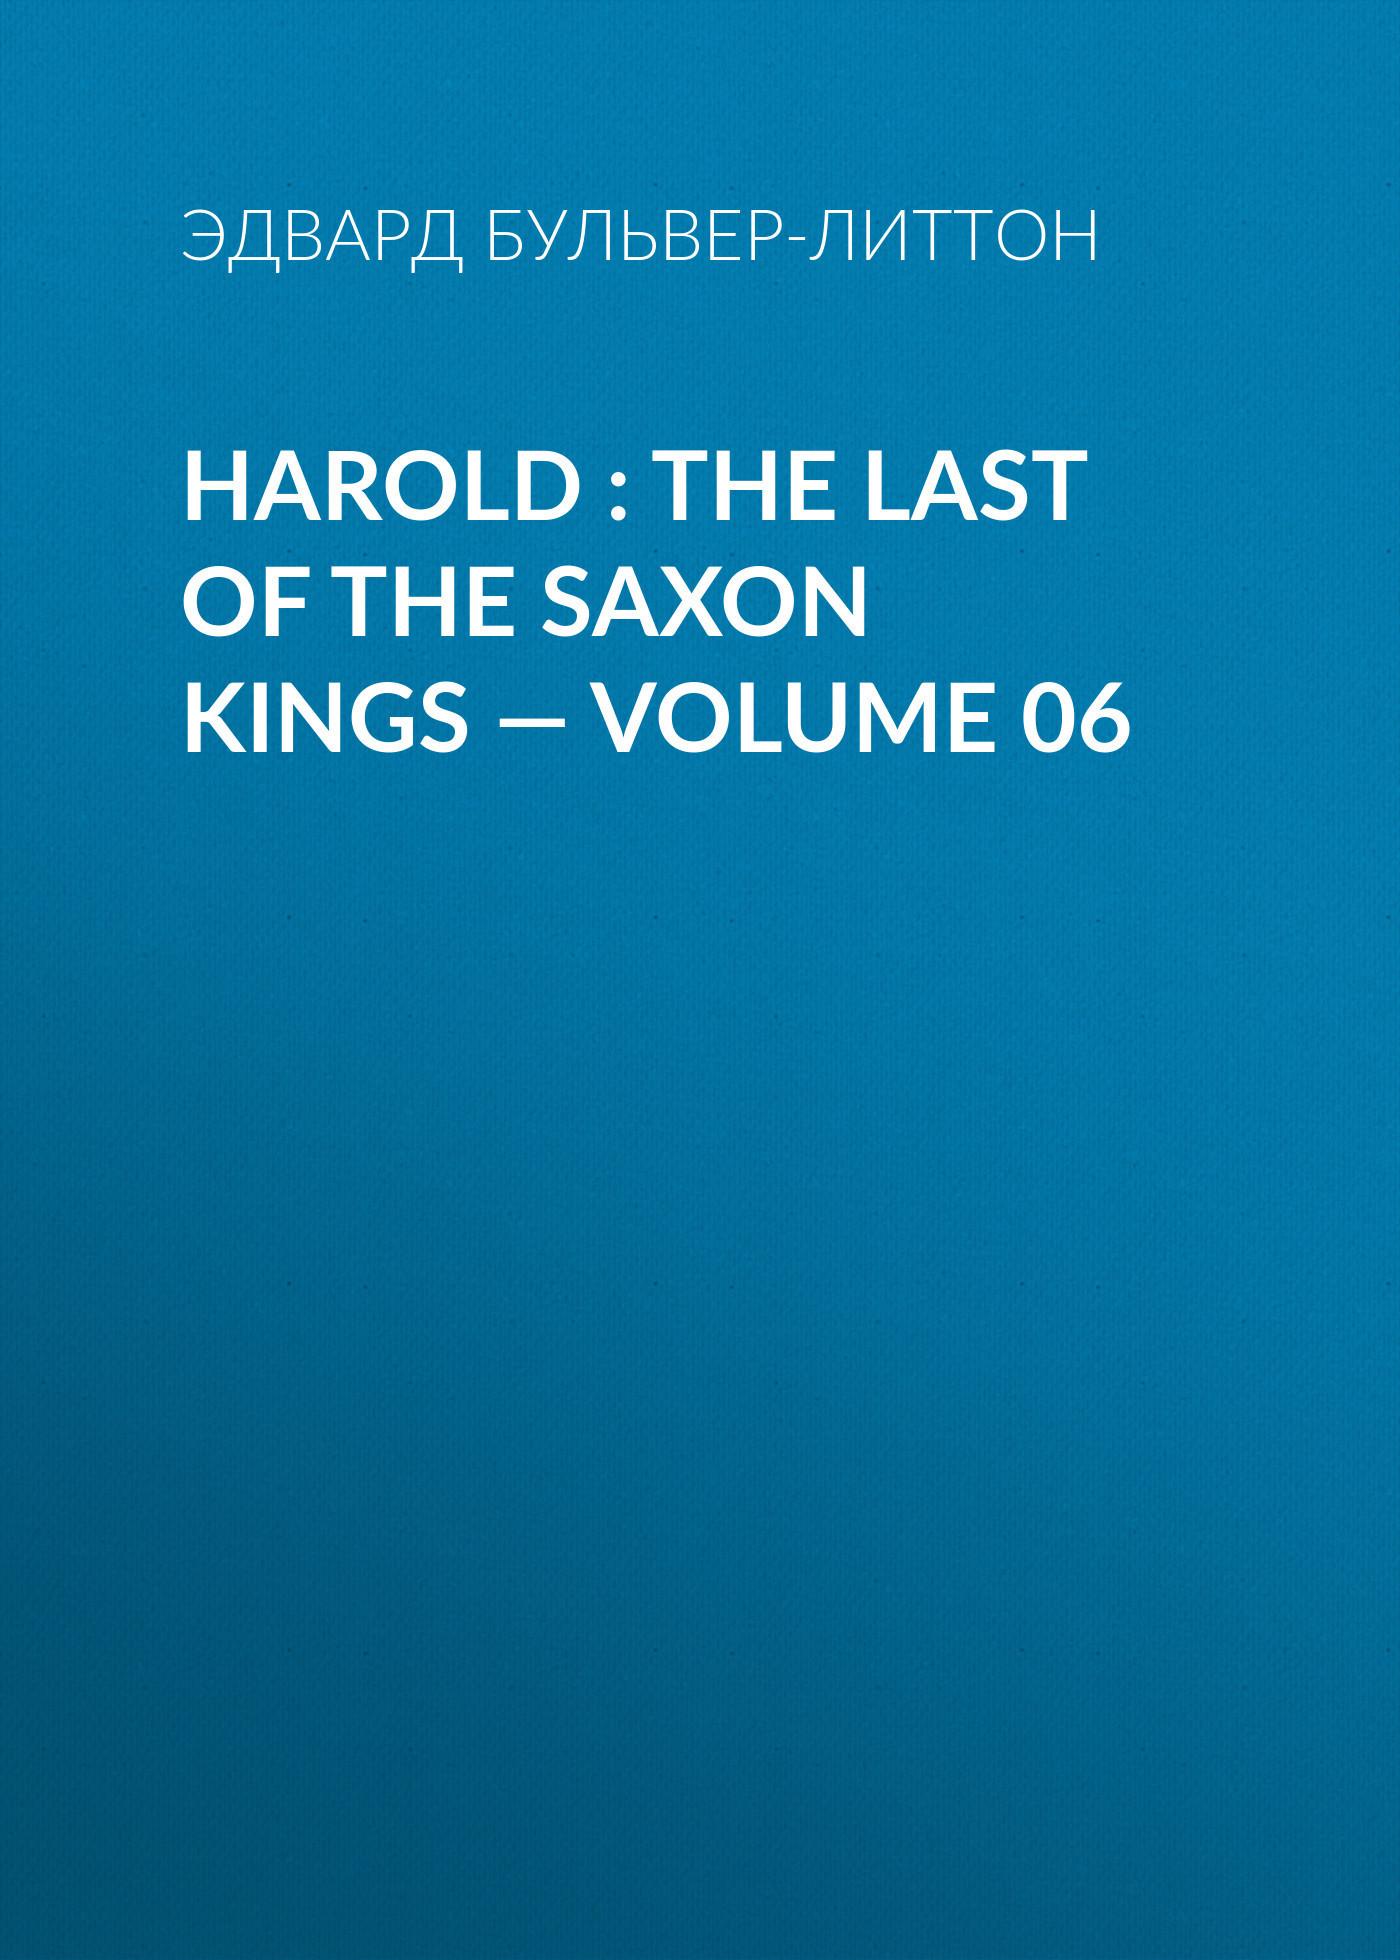 цена на Эдвард Бульвер-Литтон Harold : the Last of the Saxon Kings — Volume 06